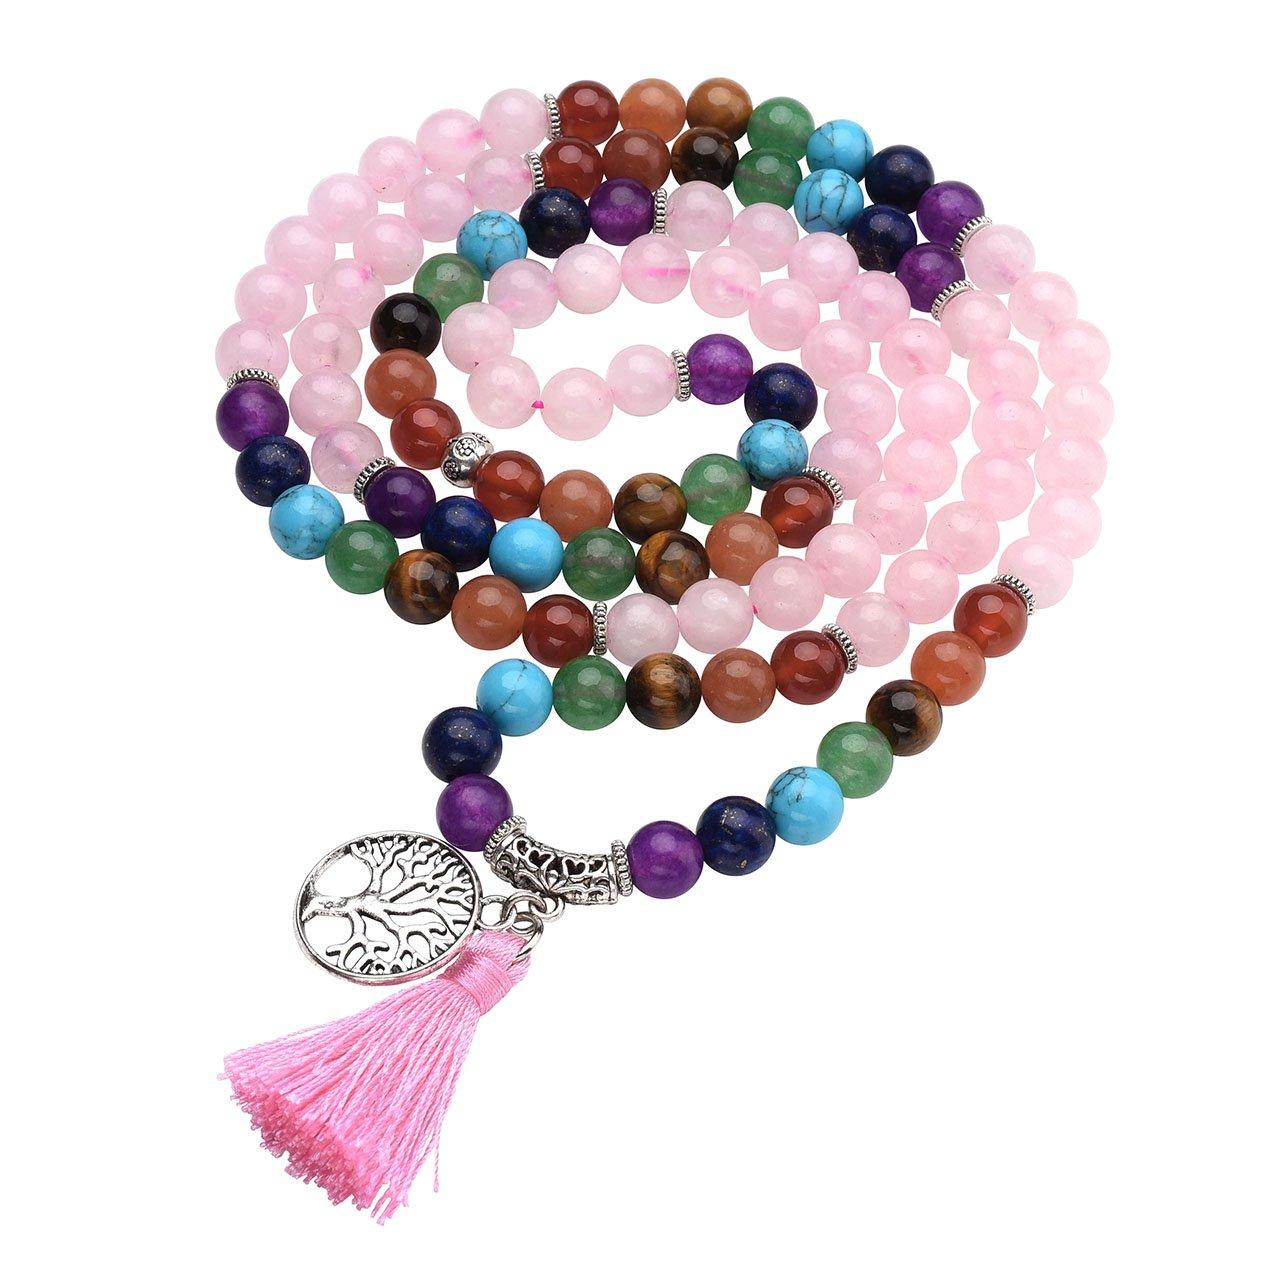 JOVIVI 8mm Natural 7 Chakra Healing Crystal Gemstone Buddhist Prayer 108 Beads Tibetan Mala Bracelet Necklace w/Tree of Life Tassel AJ1010105749